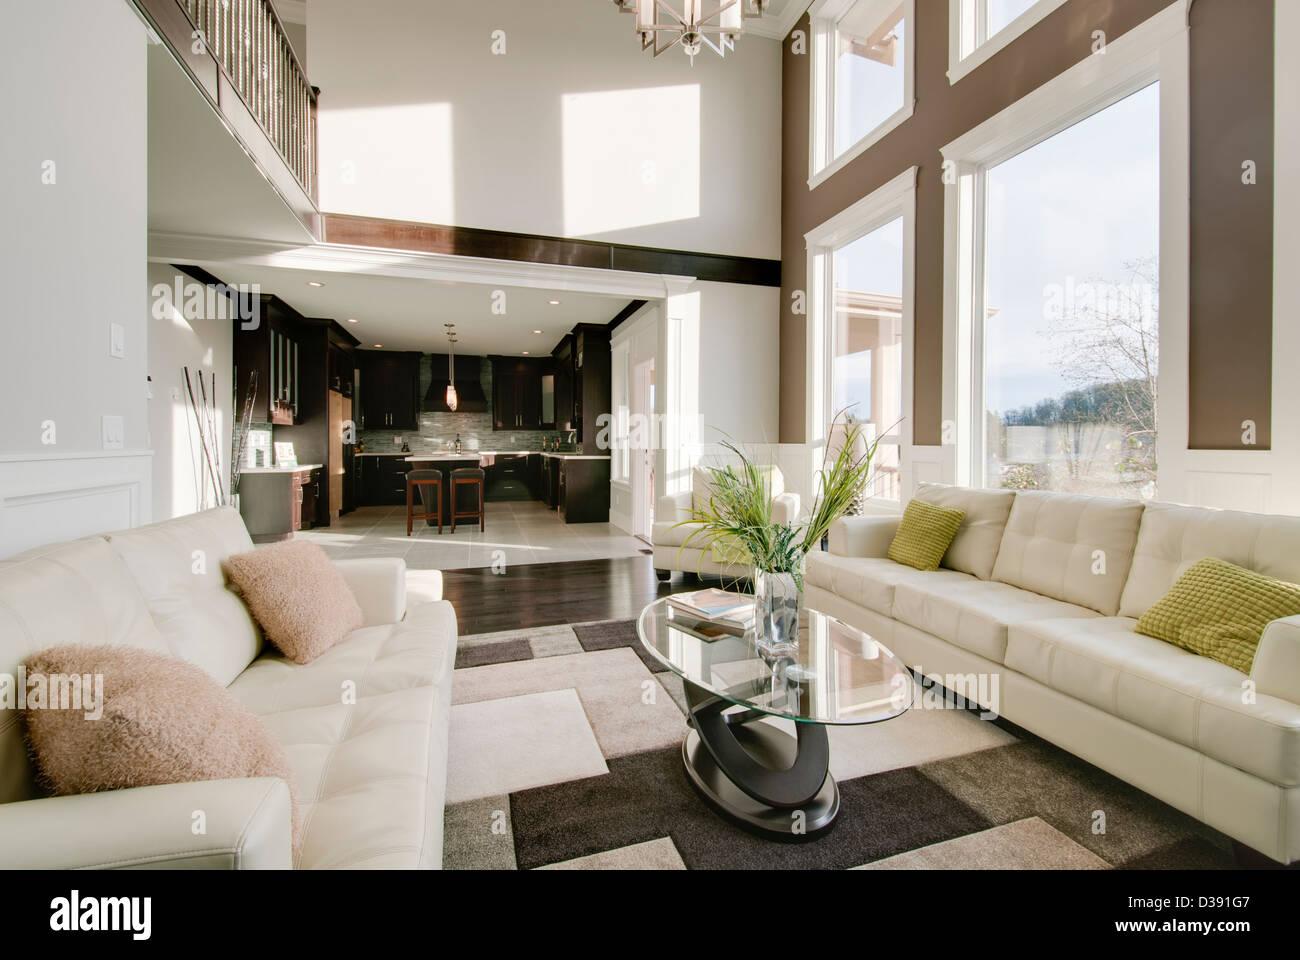 Charmant Moderne Familienzimmer Bilder Fotos - Images for ...